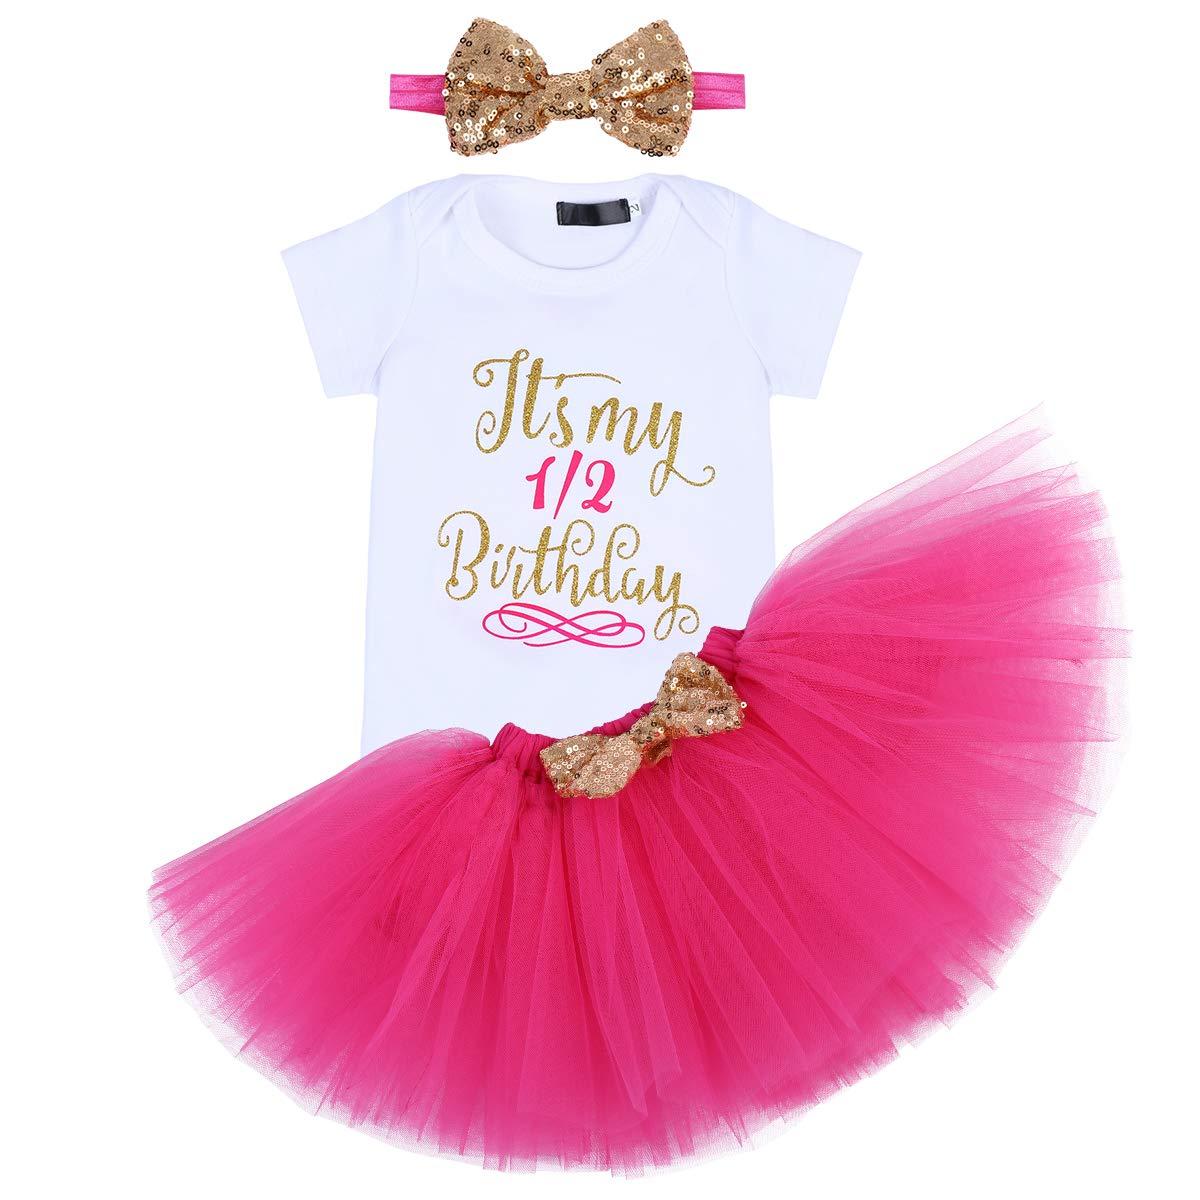 Toddler Newborn Baby Girl Tutu Skirt /& Headband Photo Prop Costume Outfit Fine